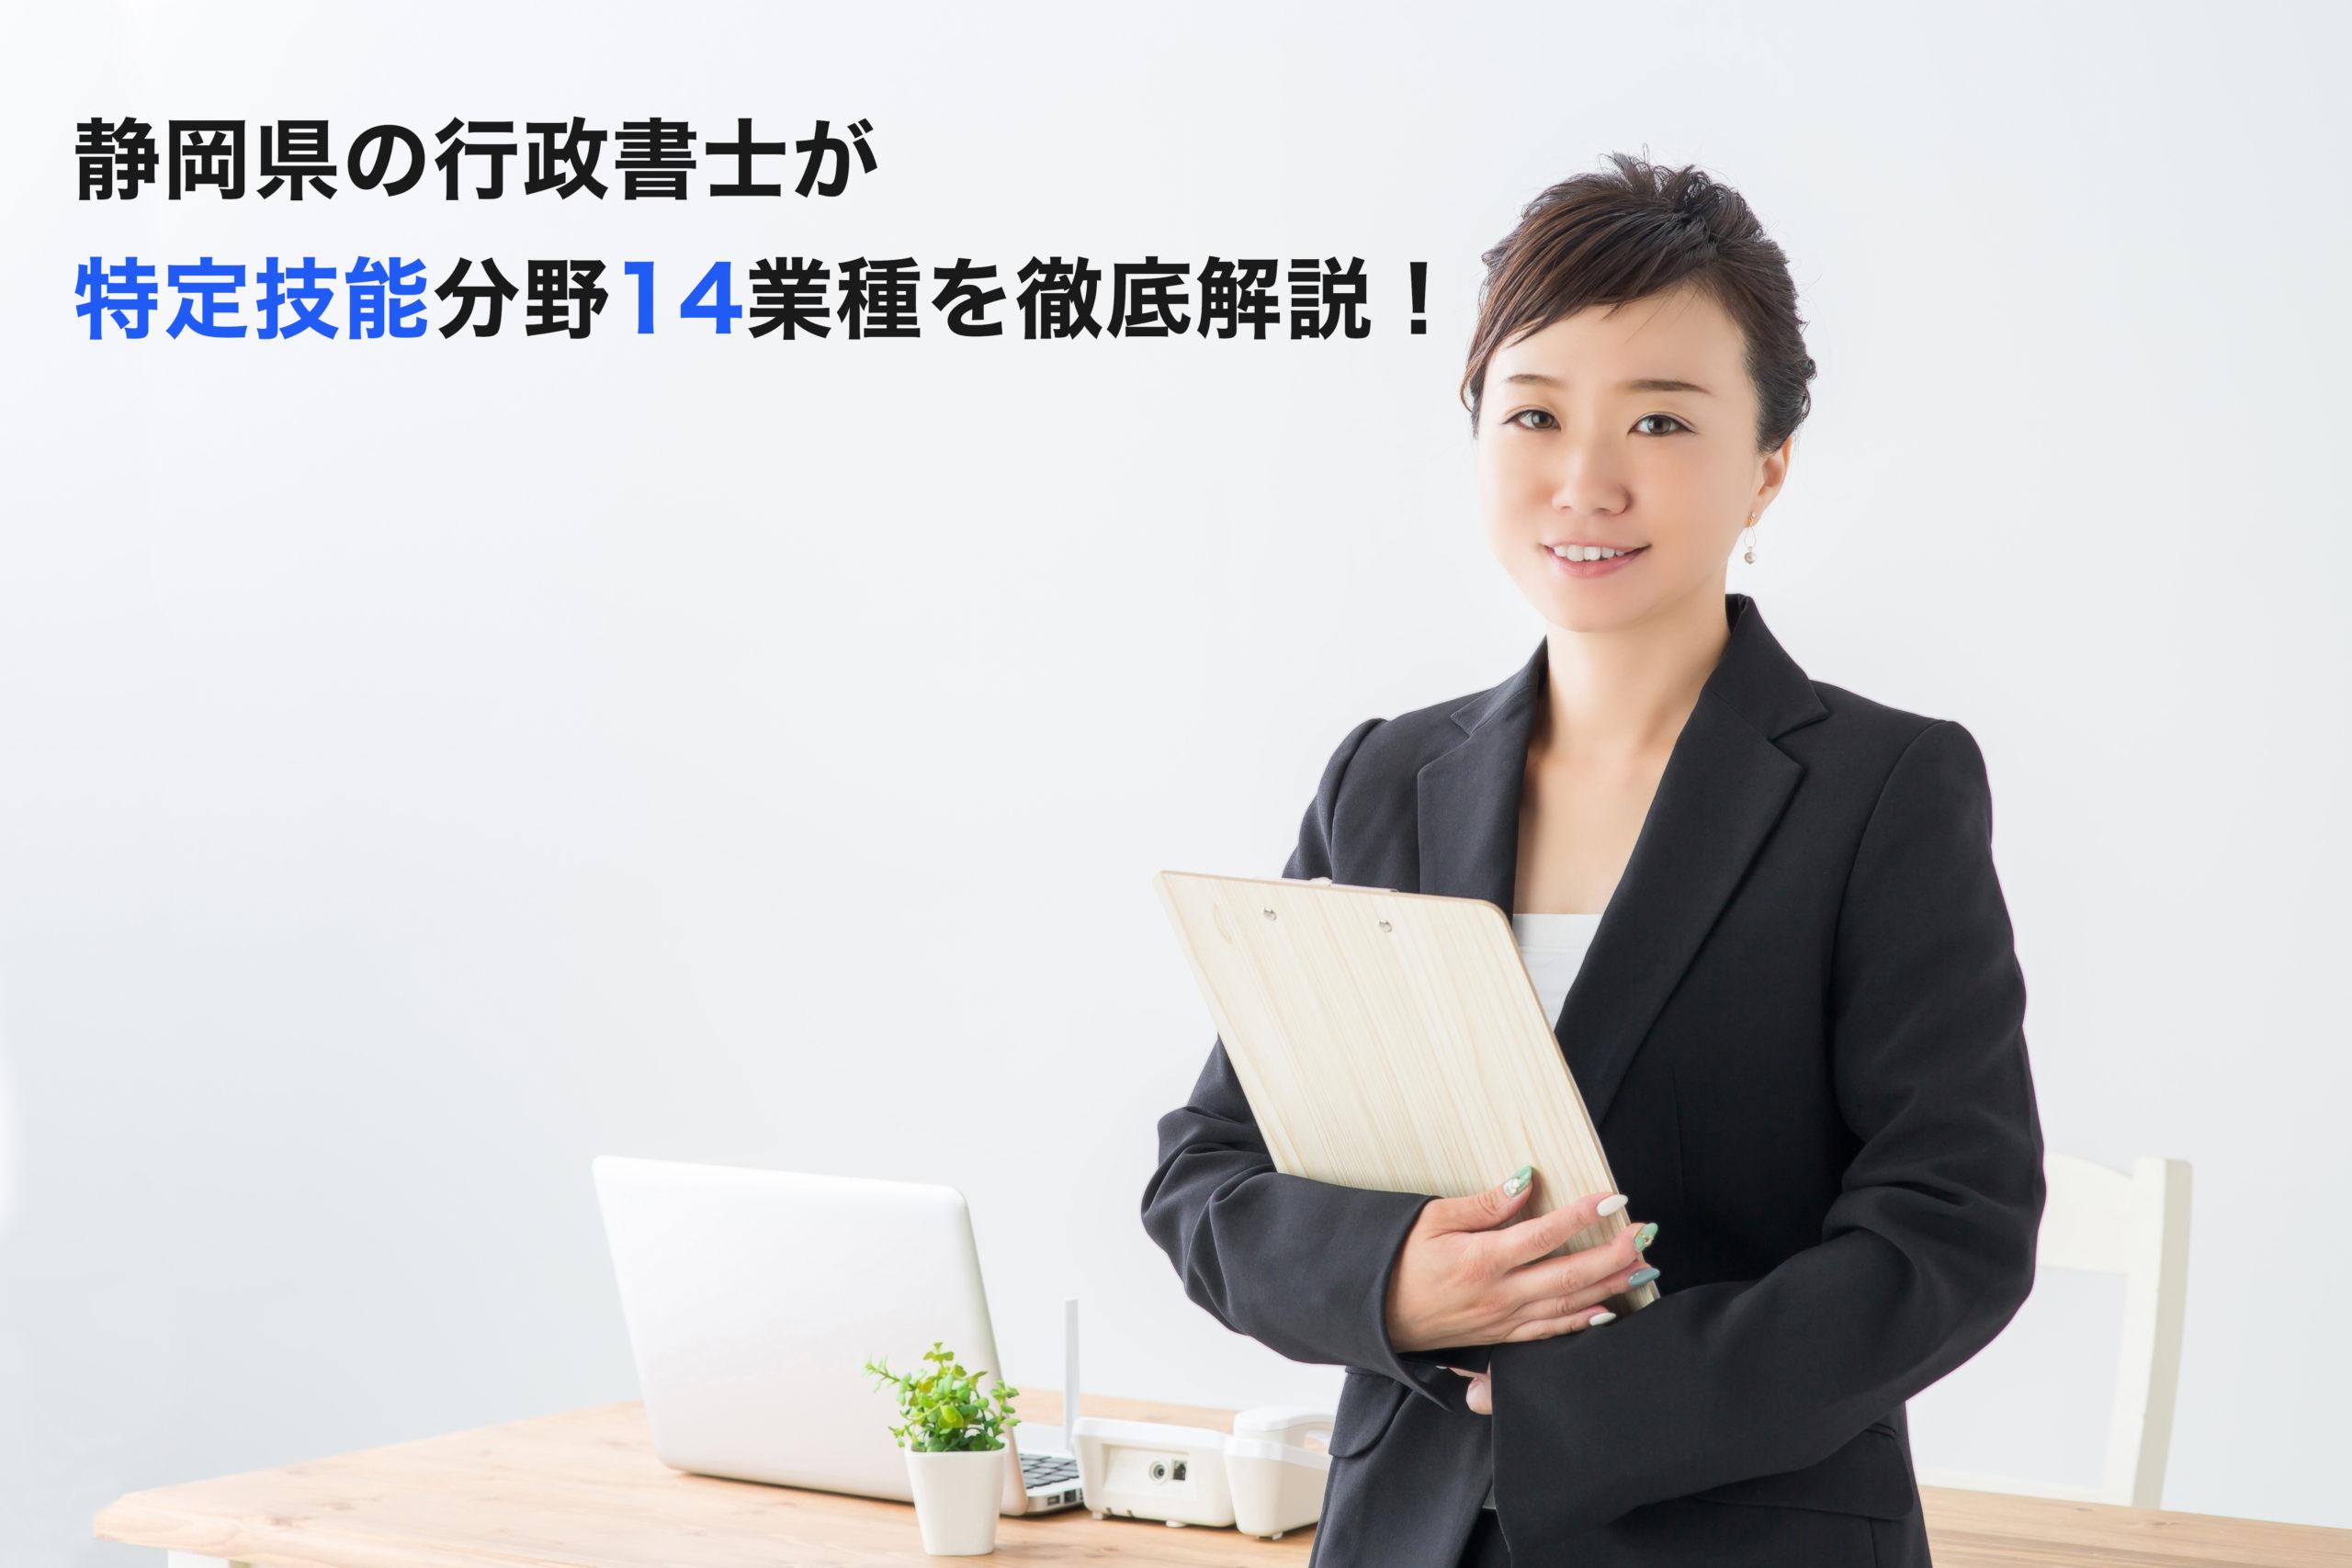 【静岡県の行政書士】特定技能分野14業種を徹底解説!